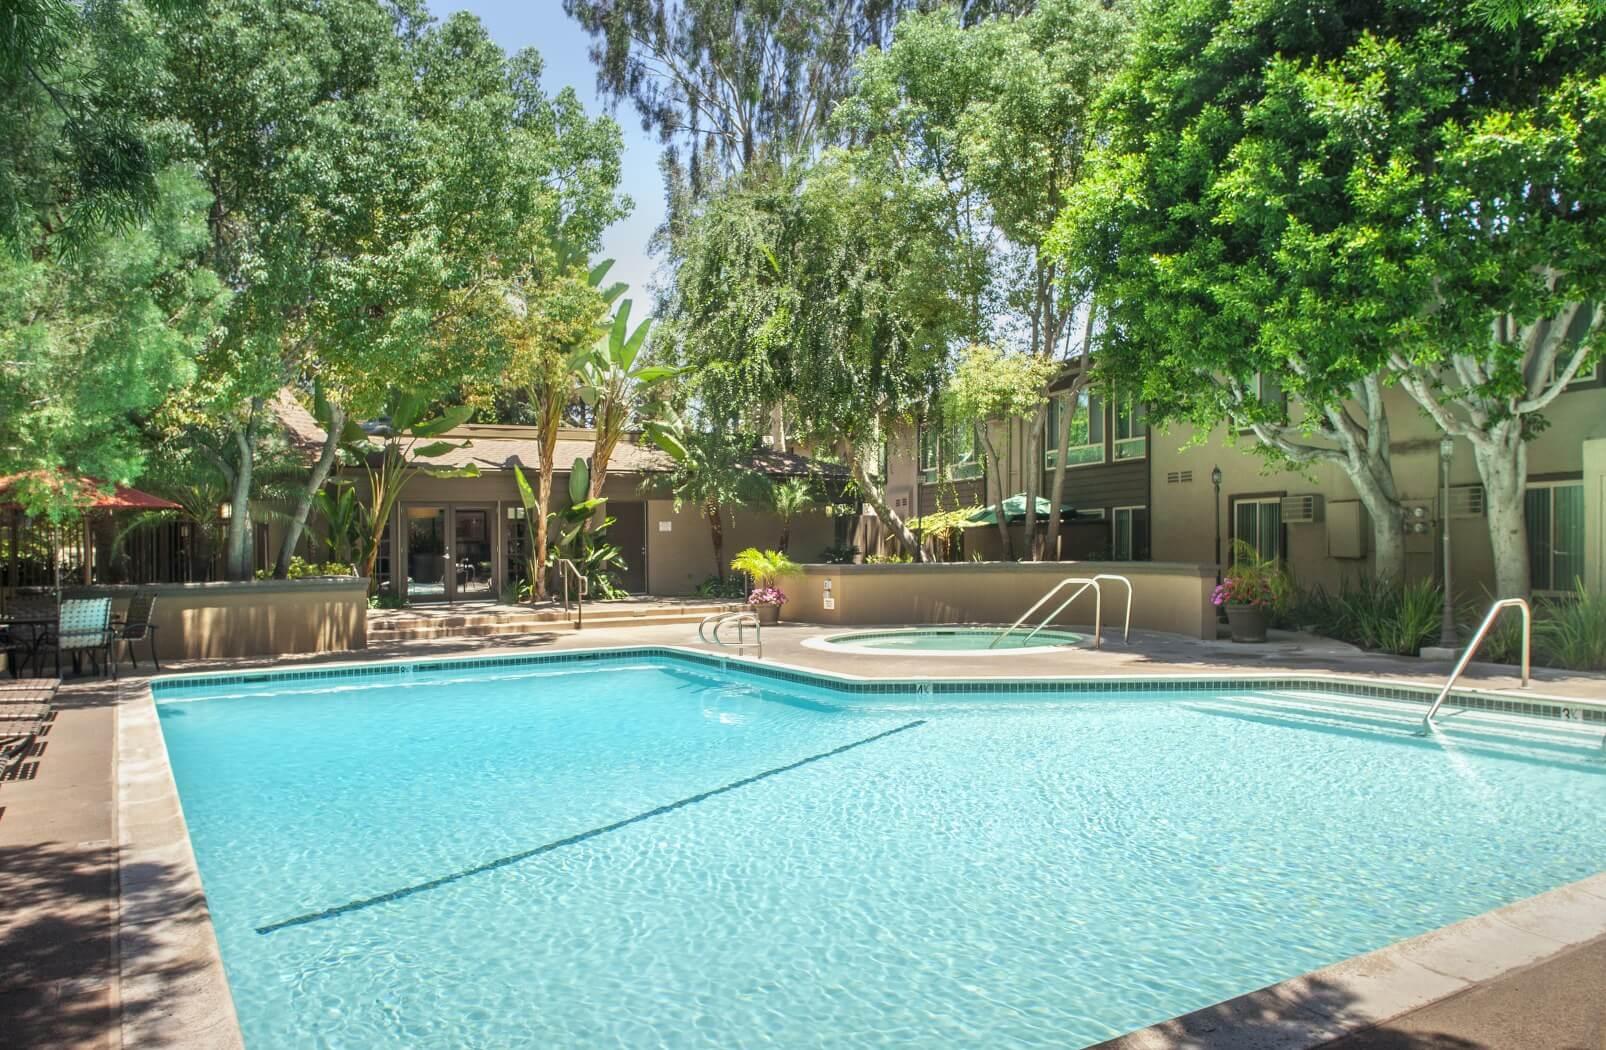 View of Sparkling Pool at Hills at Hacienda Heights, Hacienda Heights, CA,91745